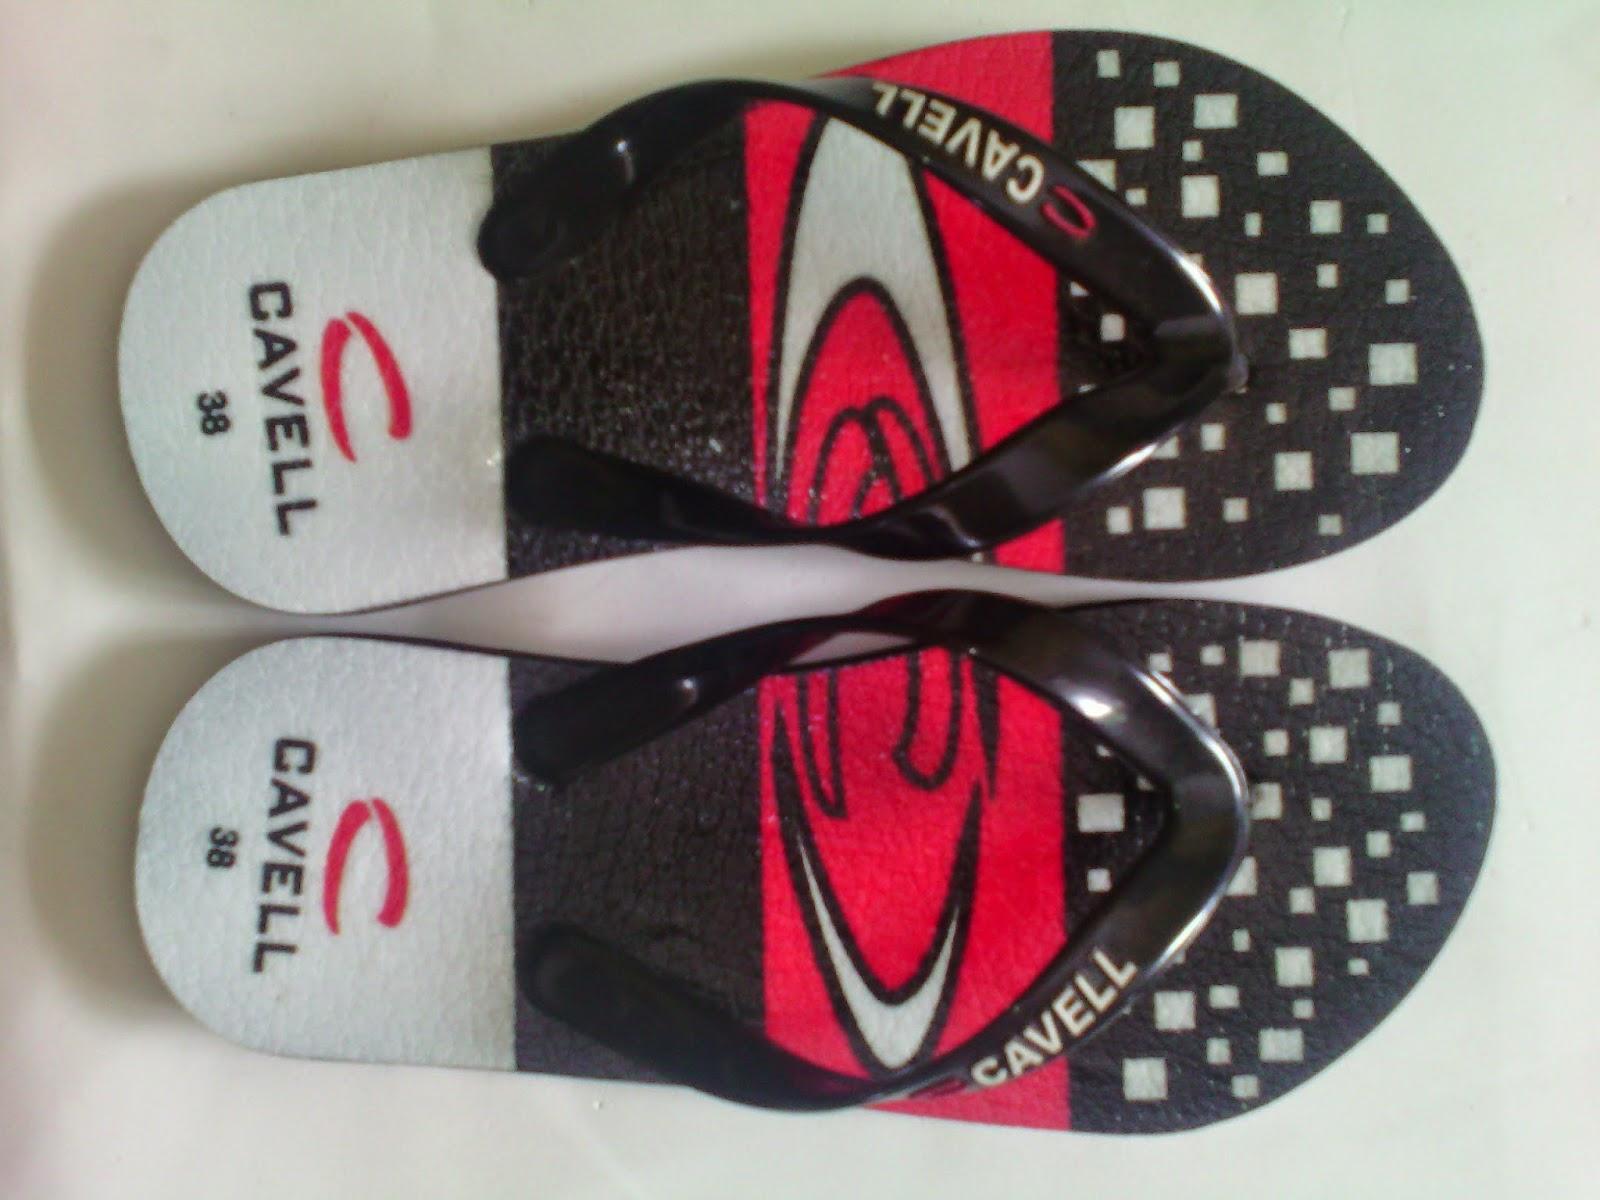 Quality Sandal (Kelom Geulis Tasikmalaya)